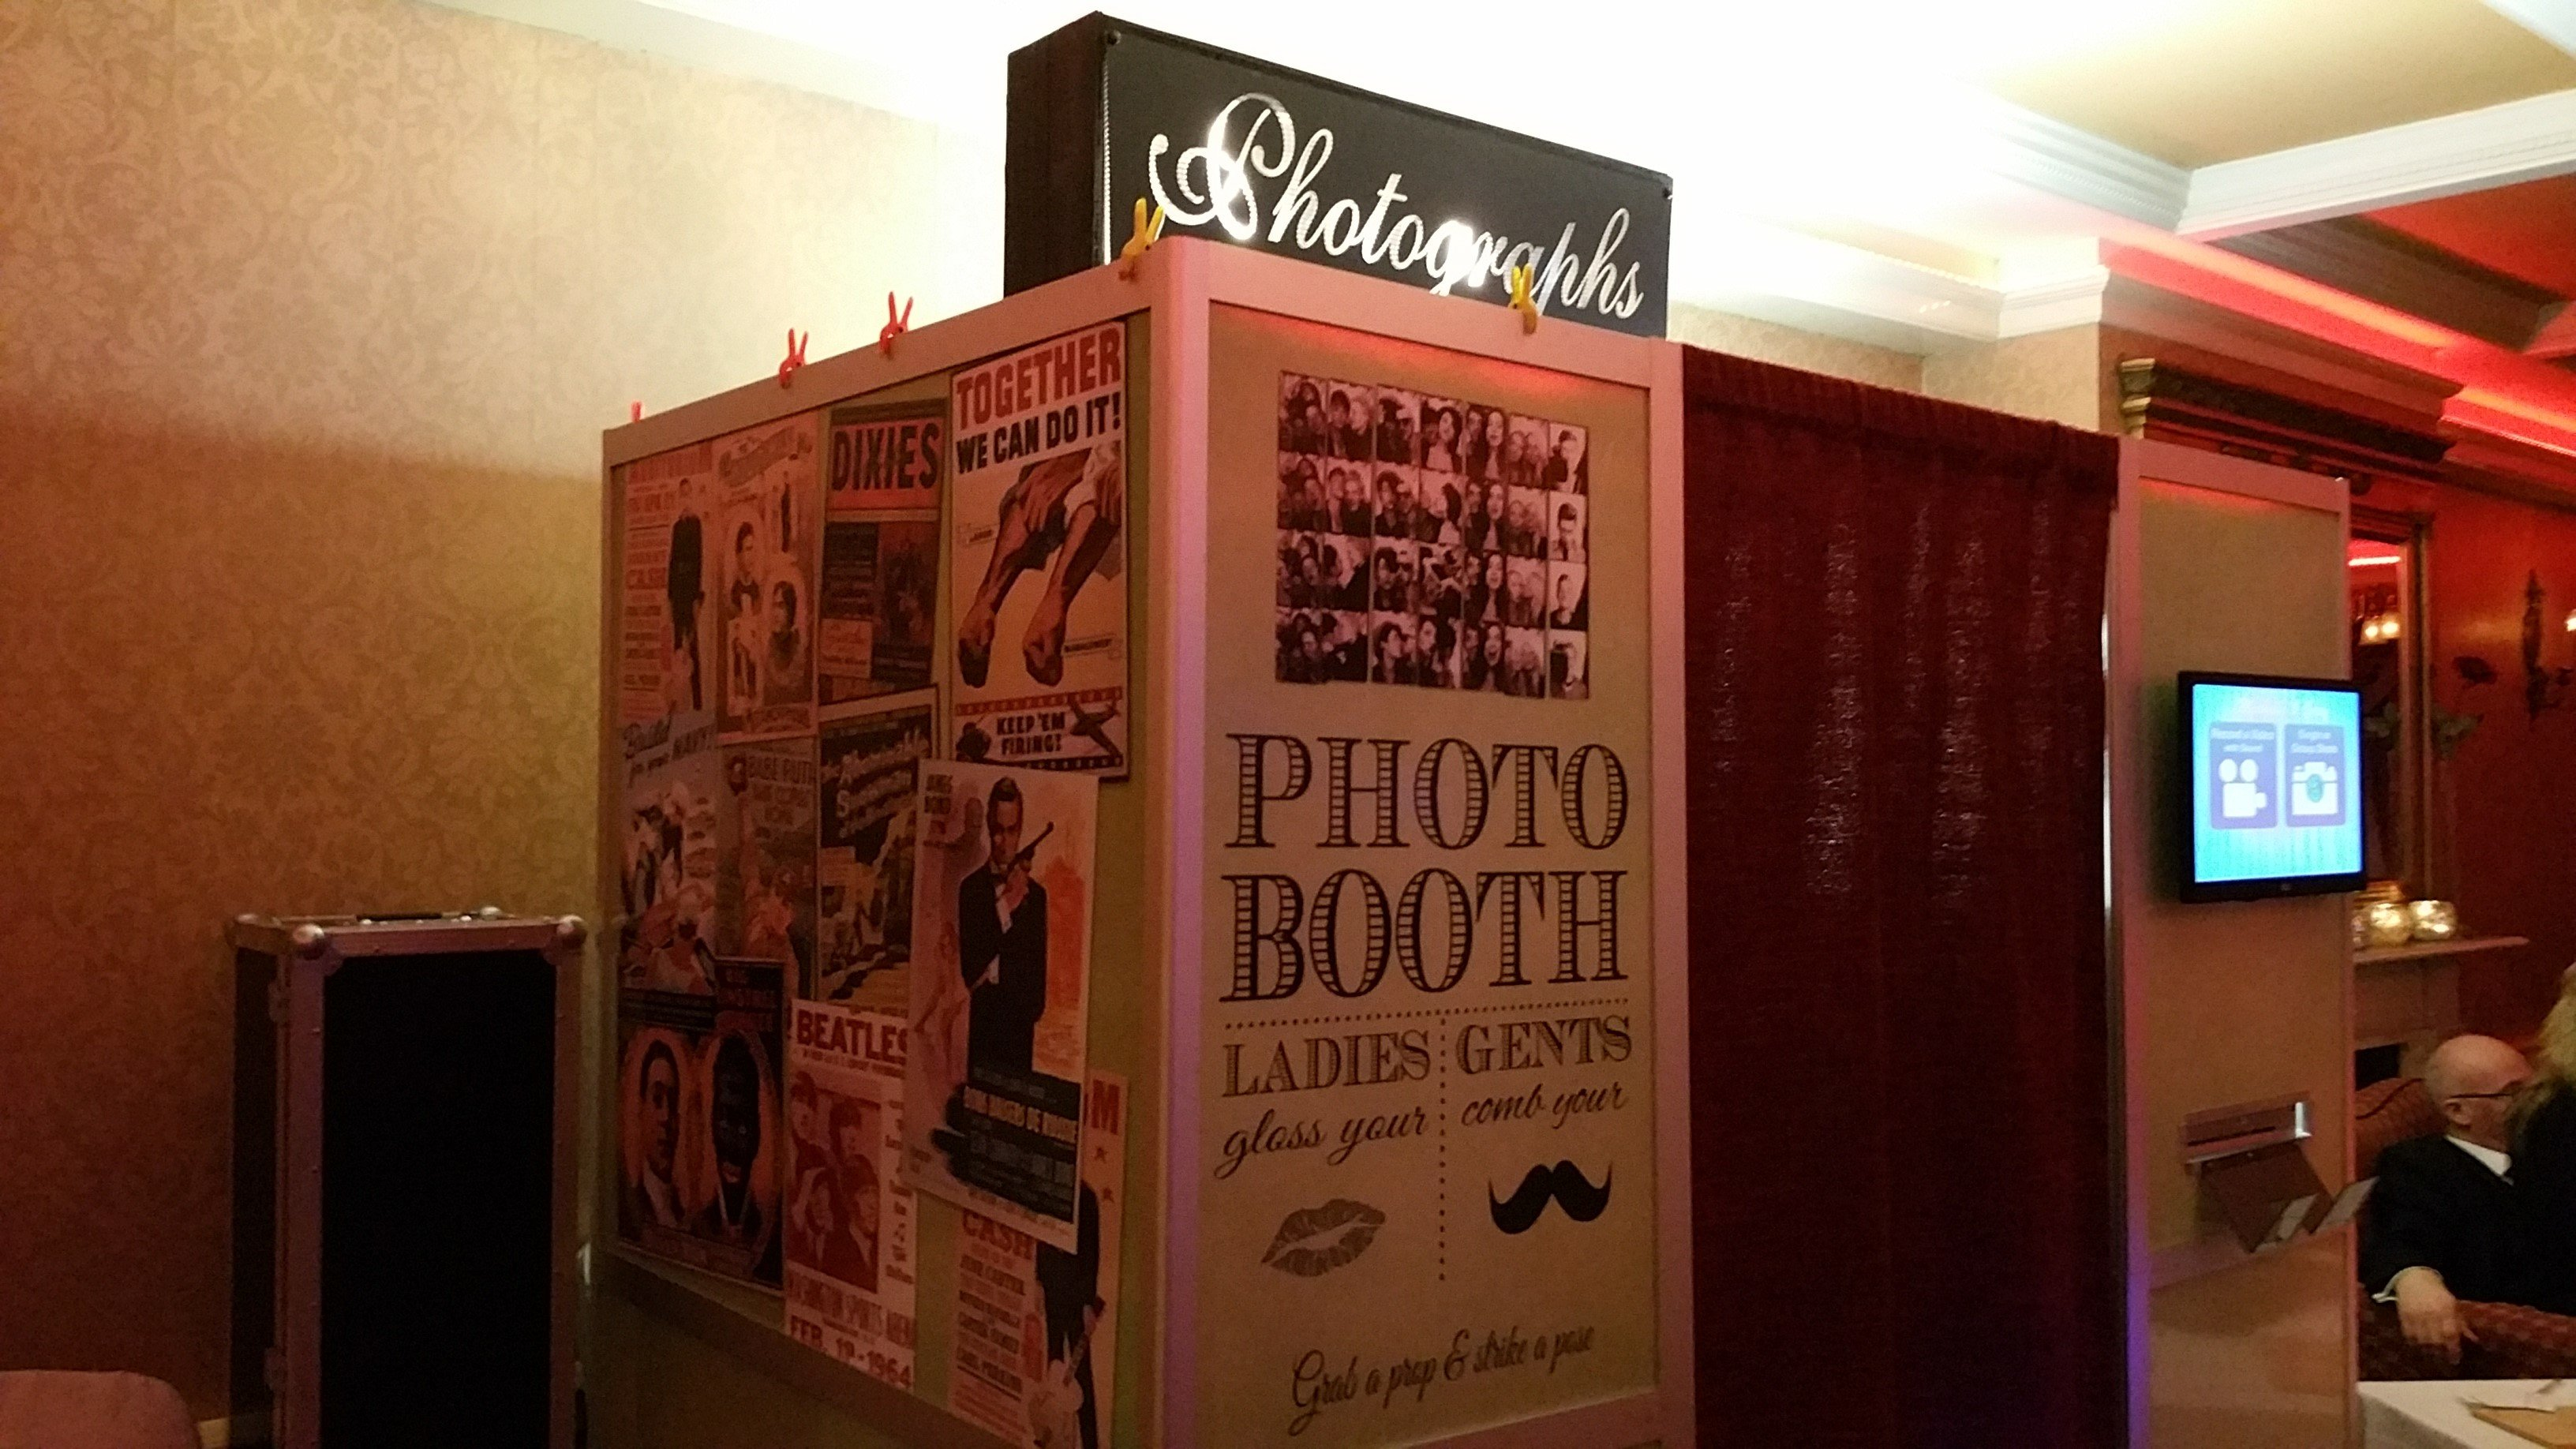 Wedding Photobooth available in Ireland